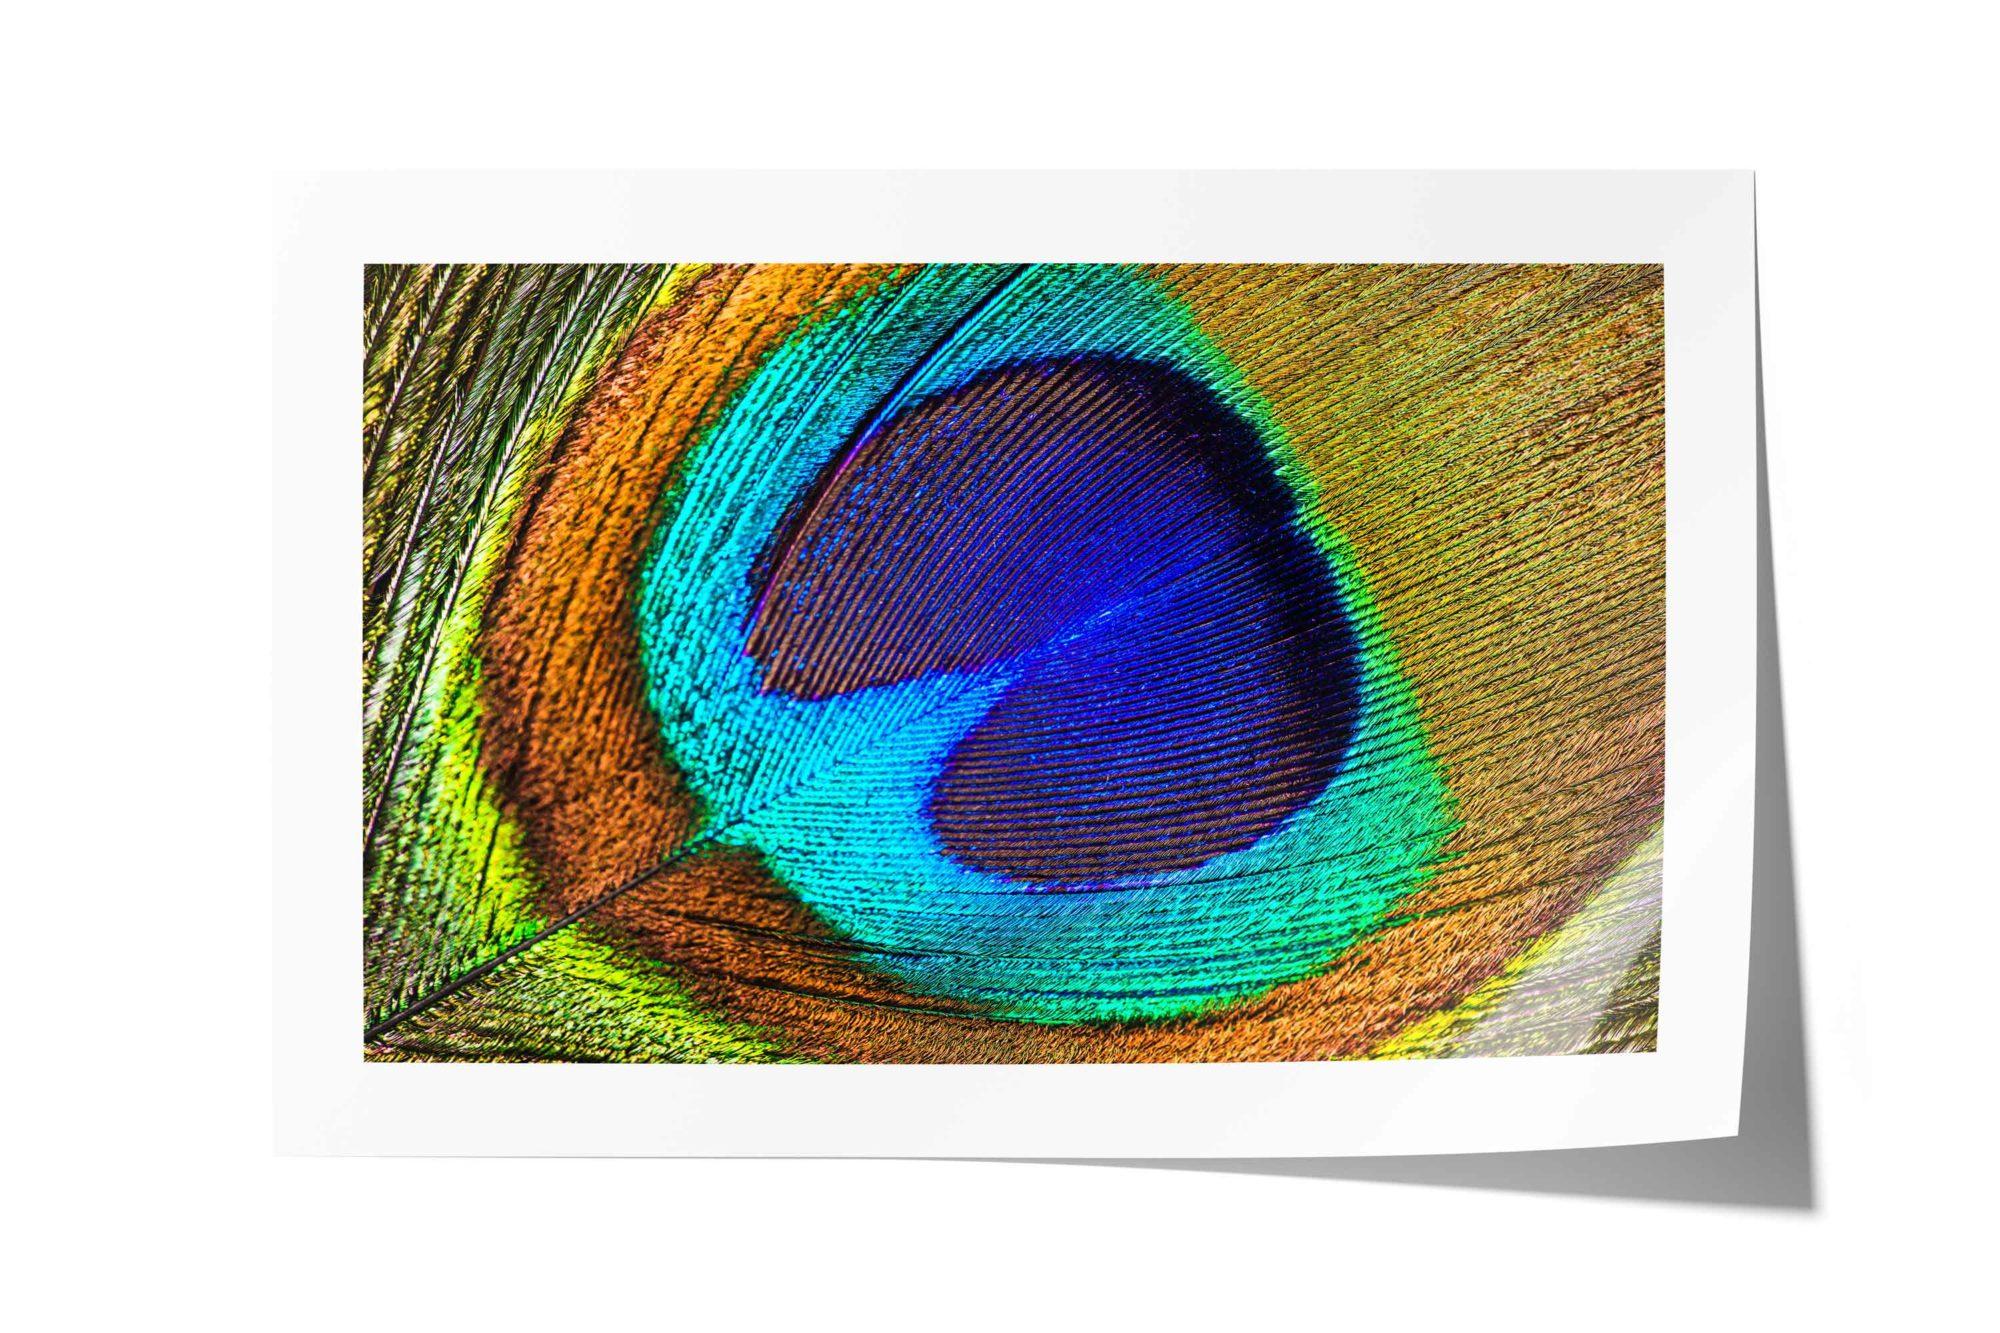 Peacock, Bird, Feather, Macro, Texture, Closeup, Color, Rainbow, Abstract, Detail